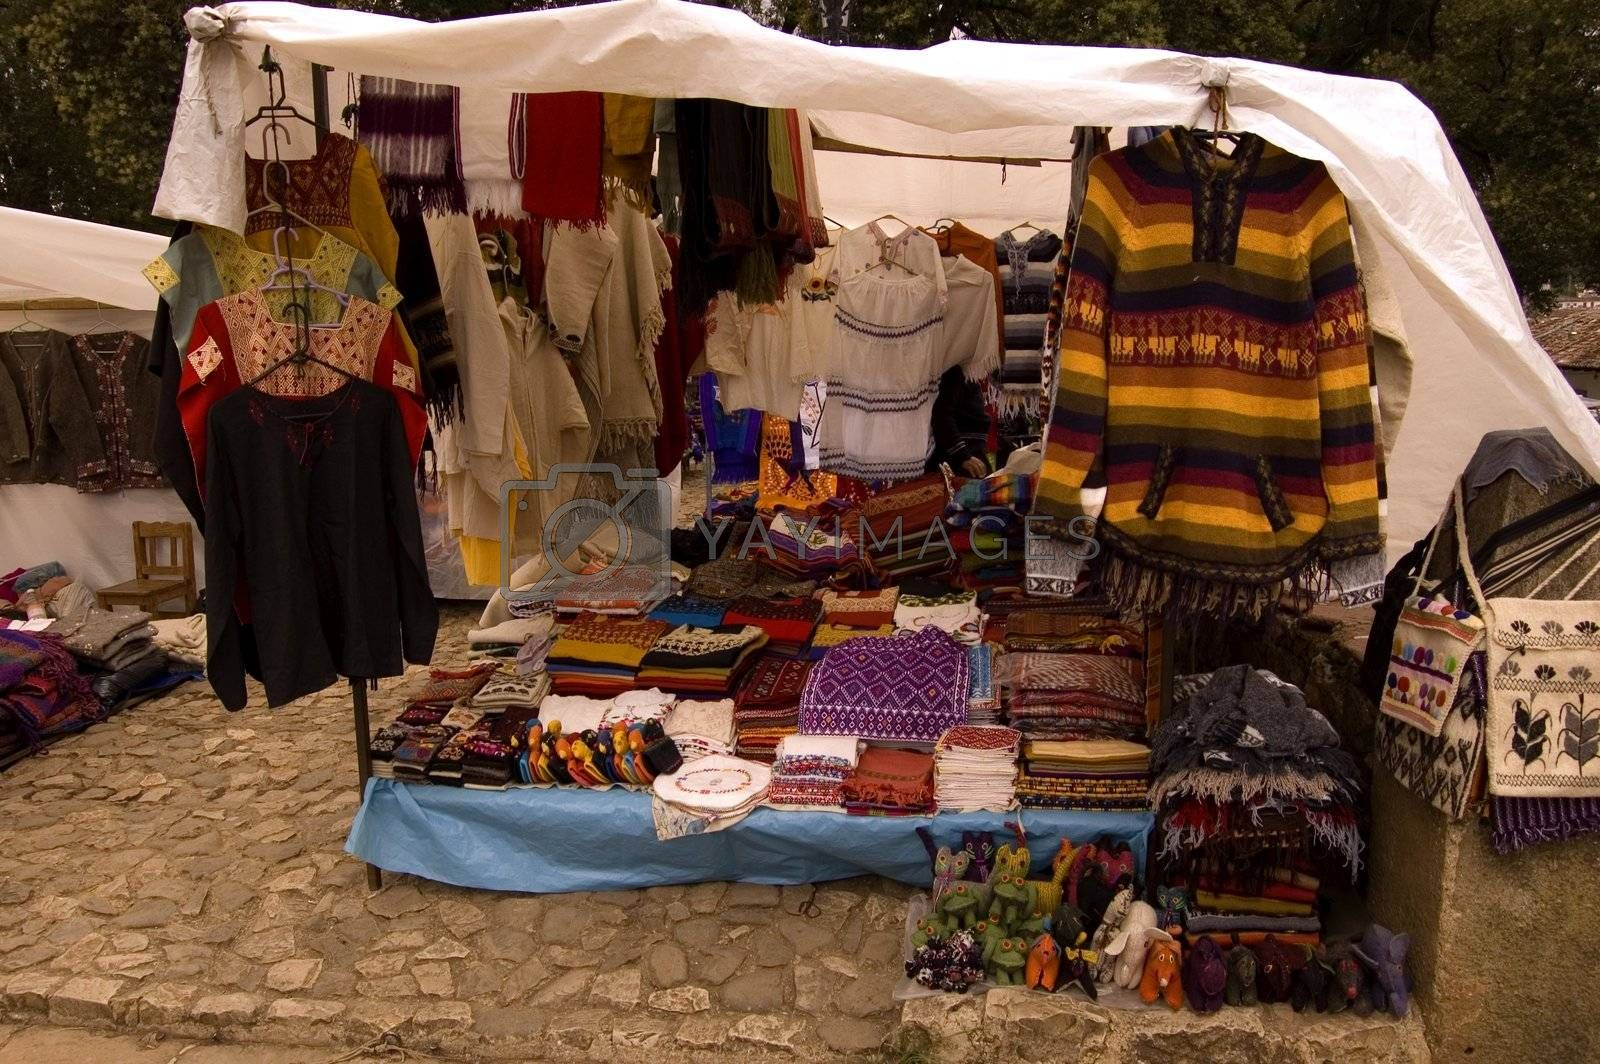 Market in Chiapas by jorgeinthewater